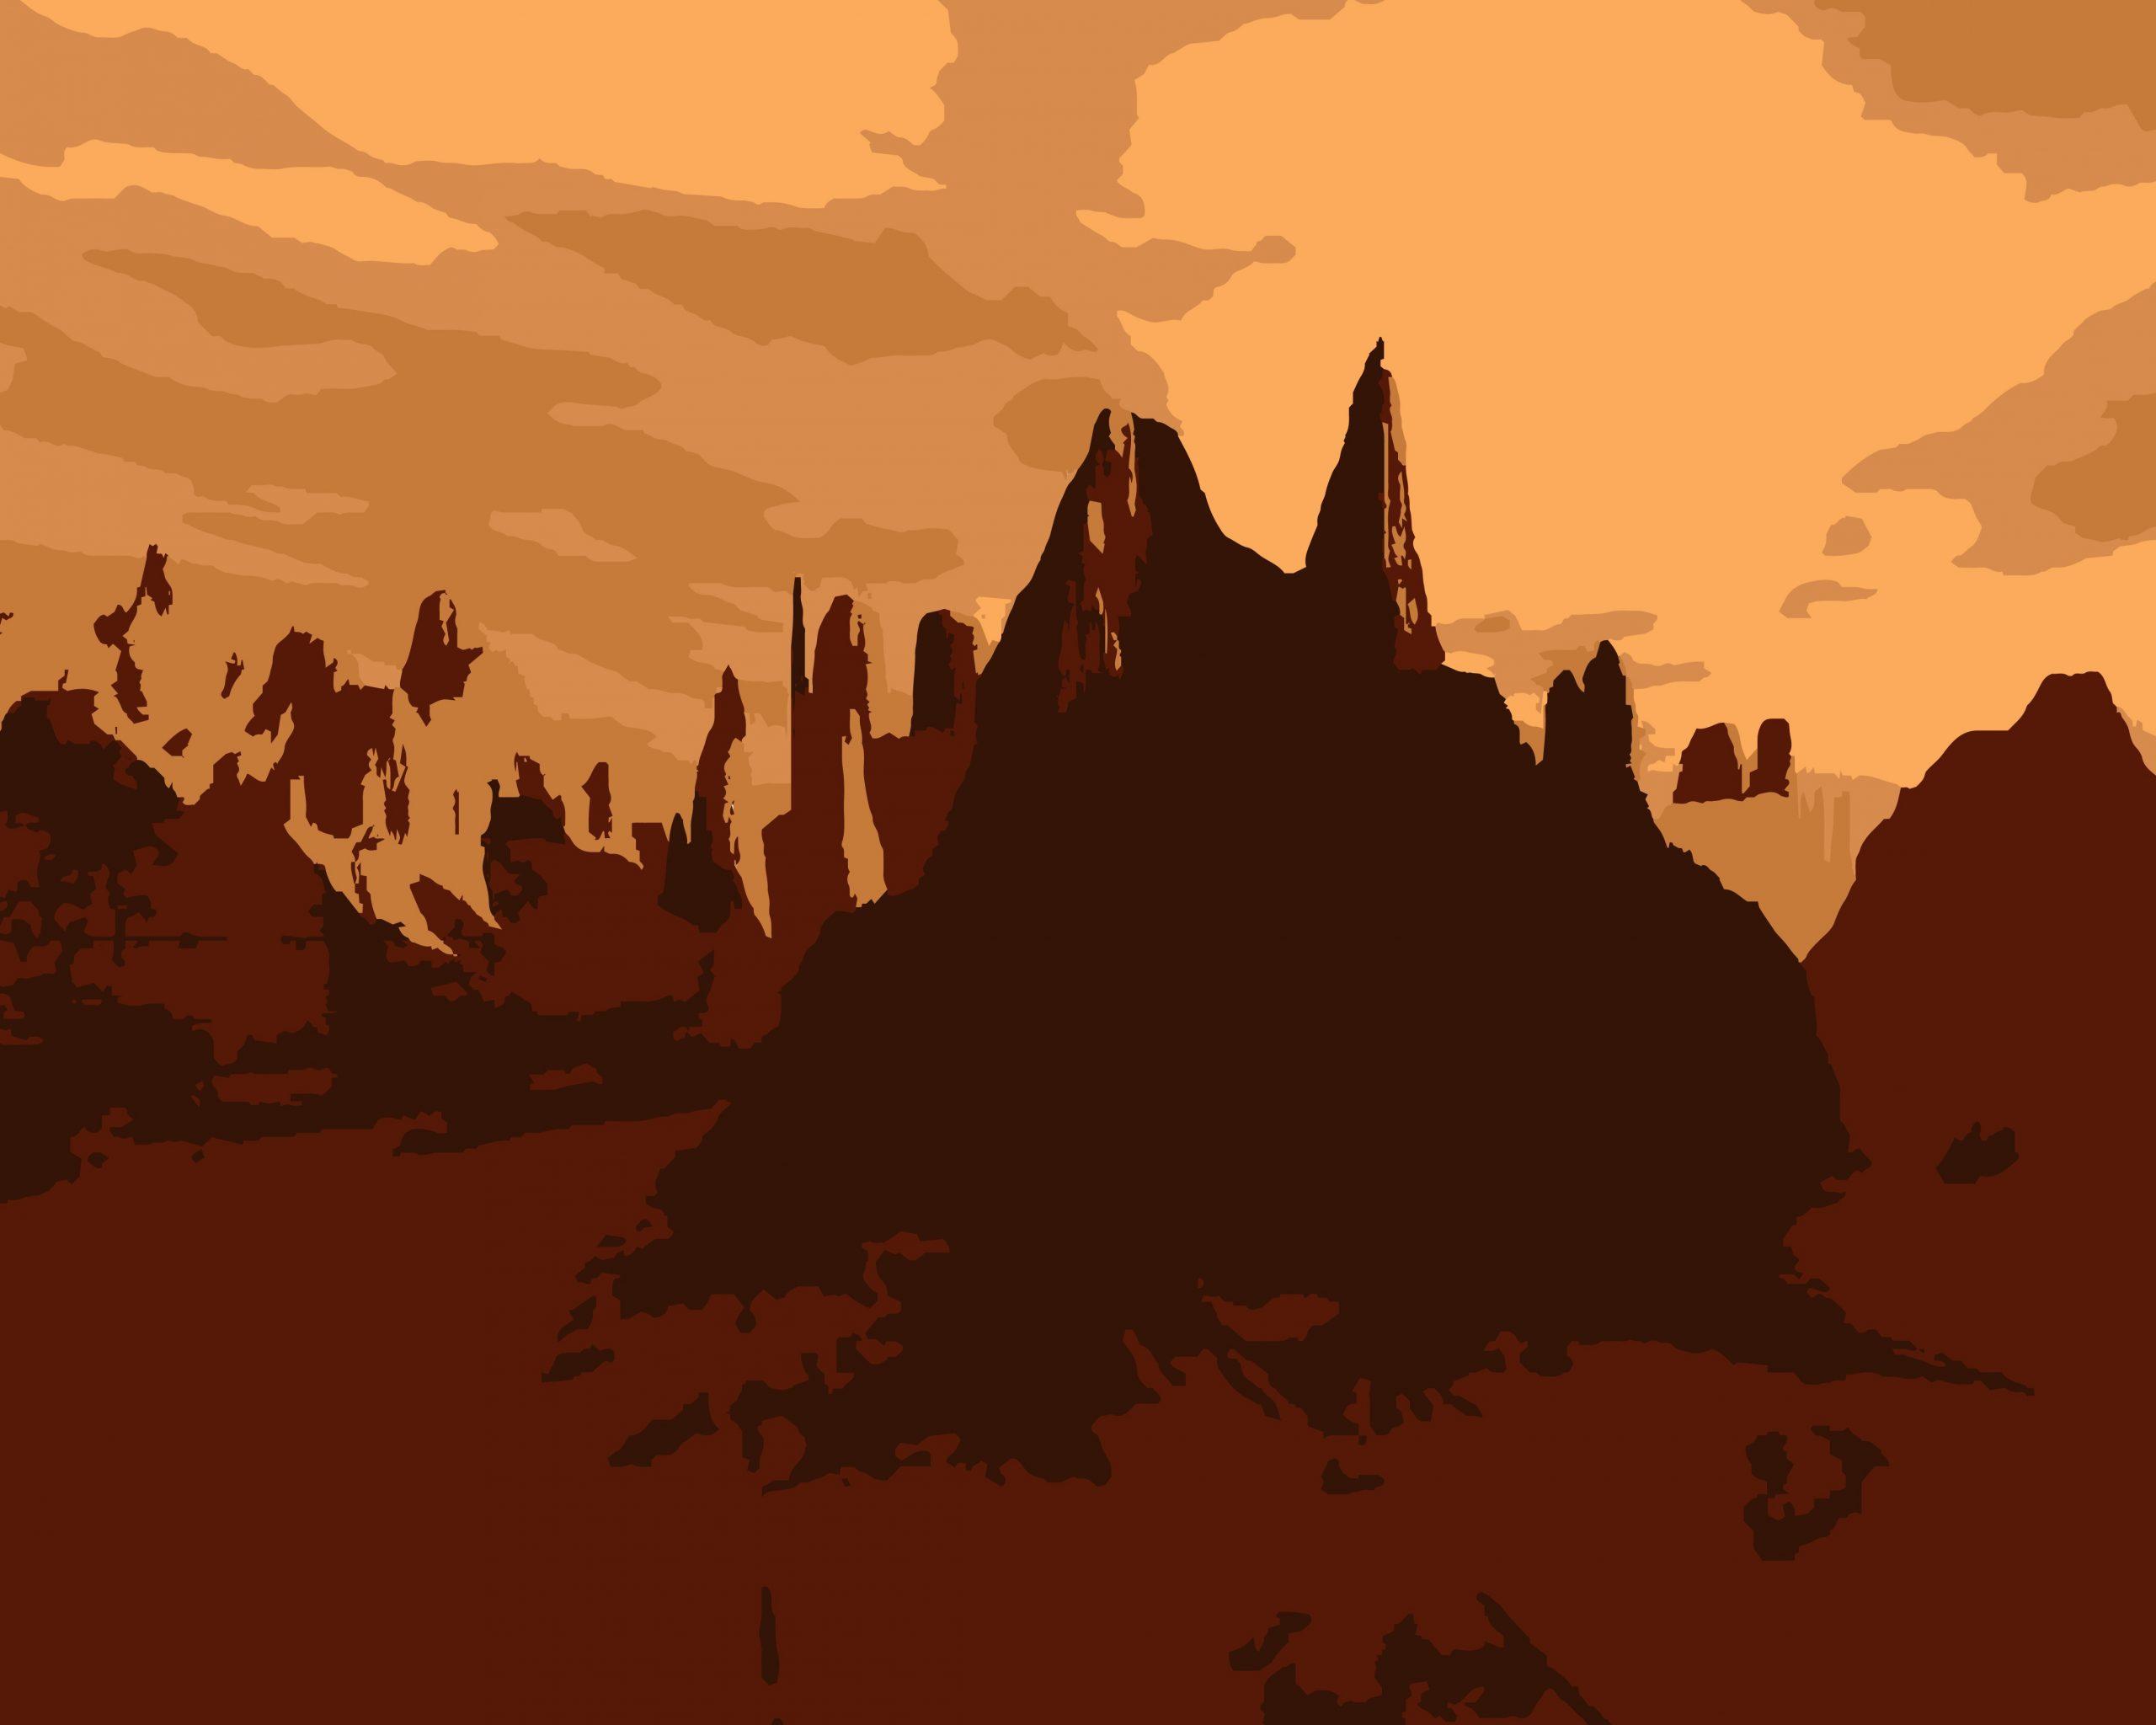 Illustration of hills